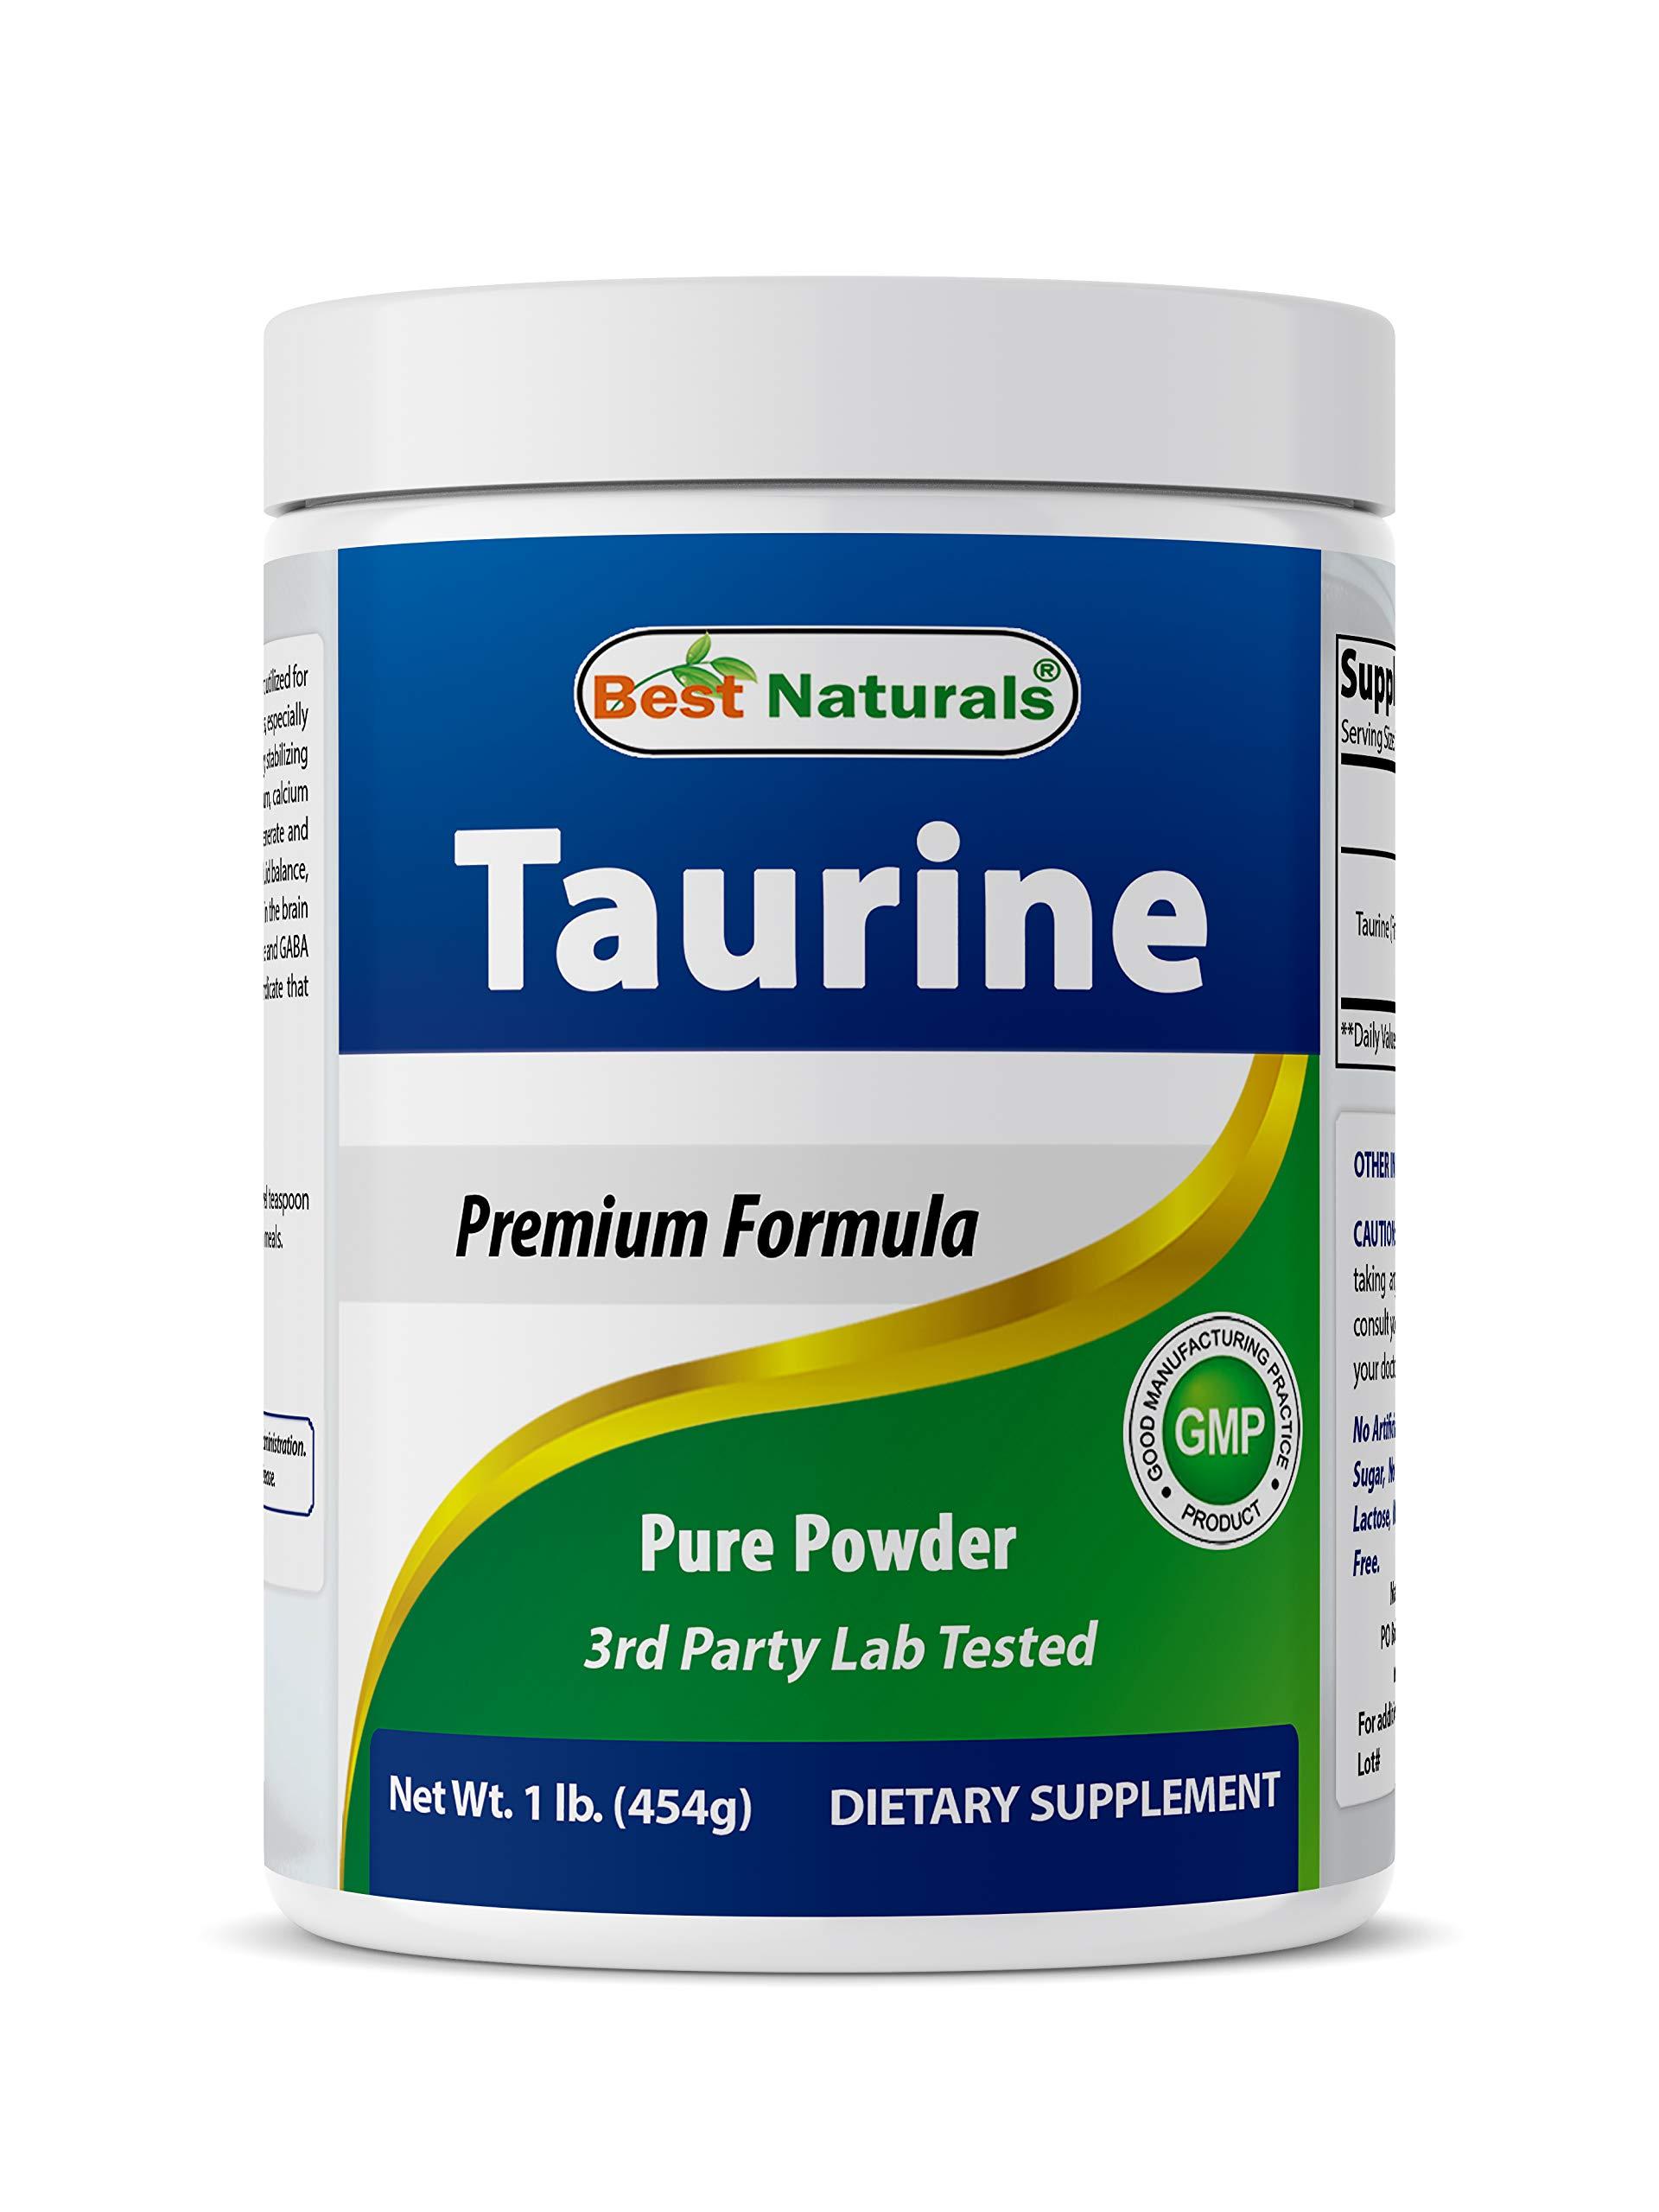 Best Naturals 100% Pure Taurine Powder Free Form - Taurine 1000mg per Serving - 1 Lb (454 gm)